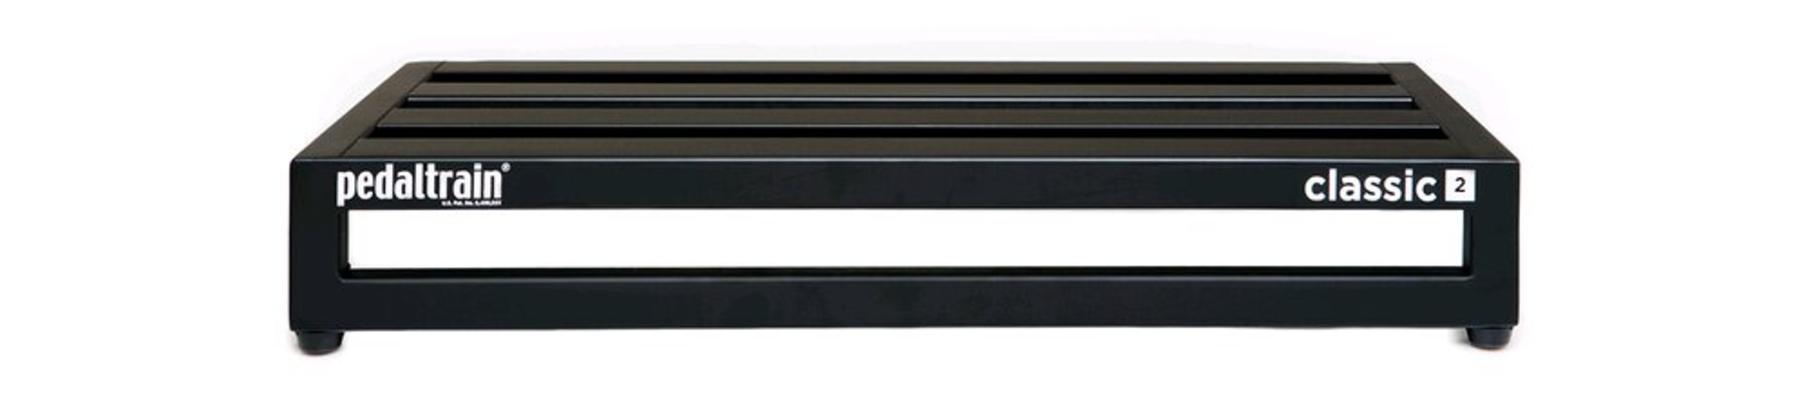 Pedaltrain Classic 2 Soft Case